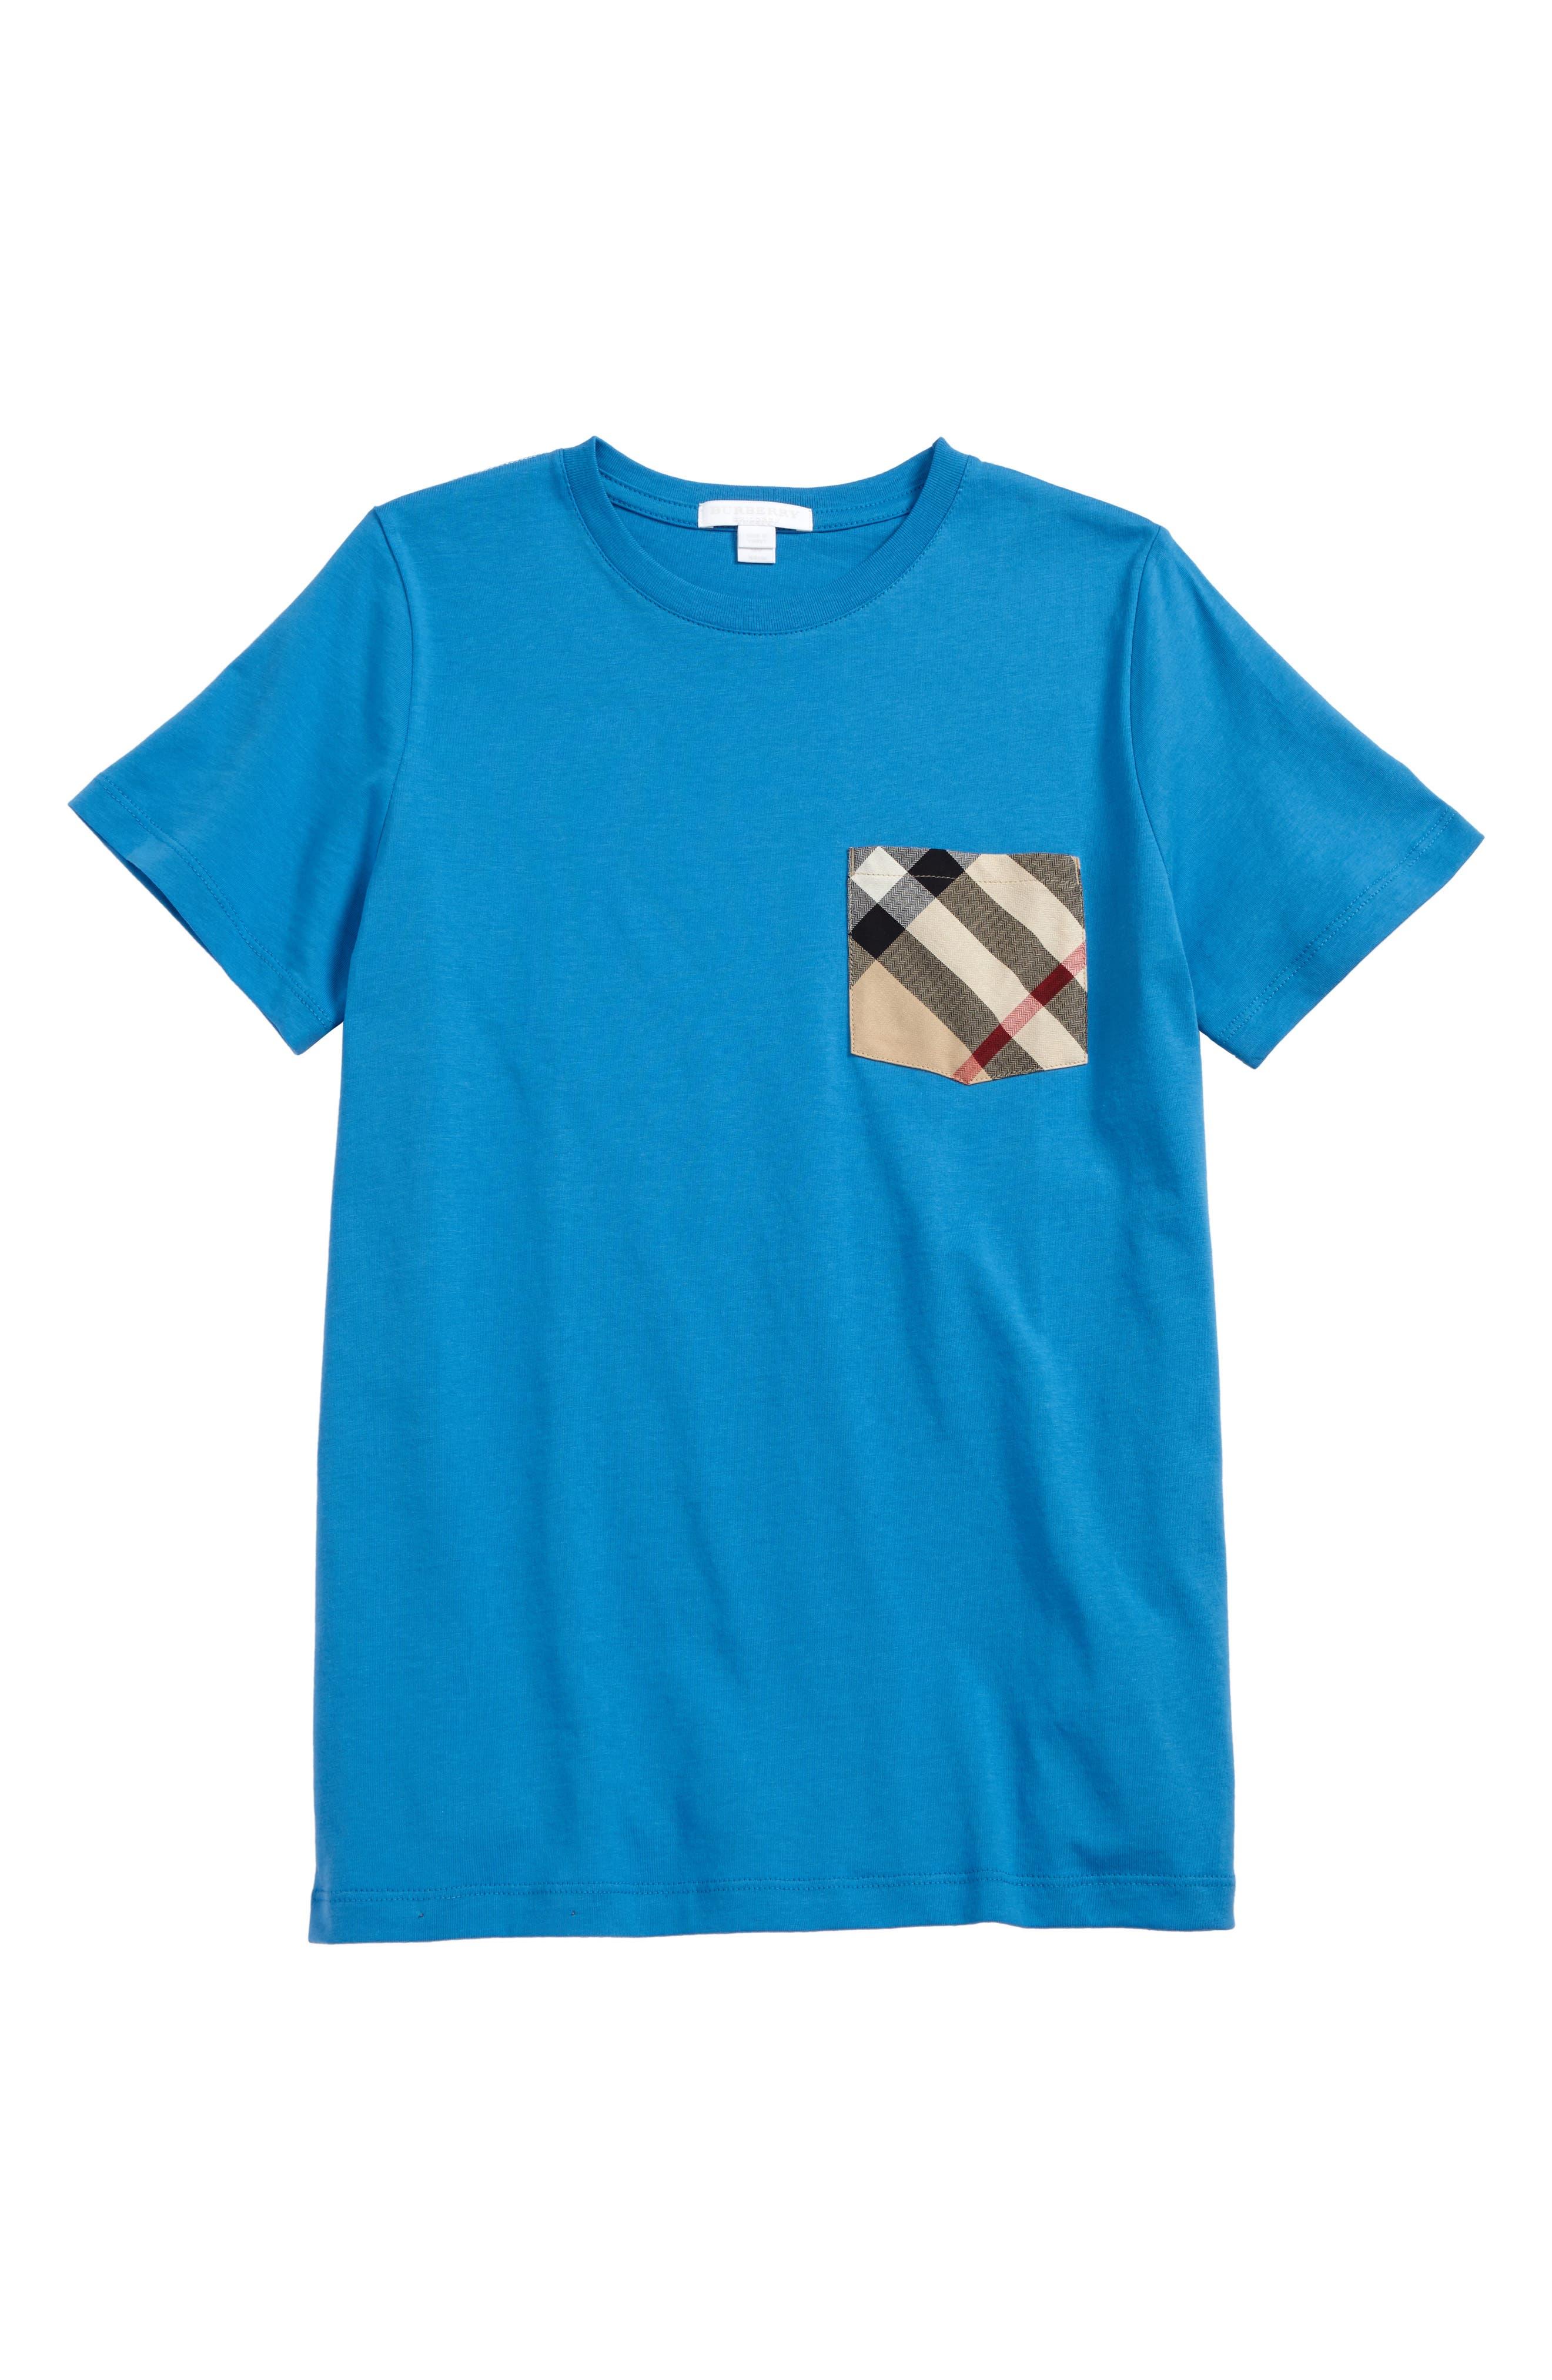 Burberry Pocket T-Shirt (Little Boys & Big Boys)